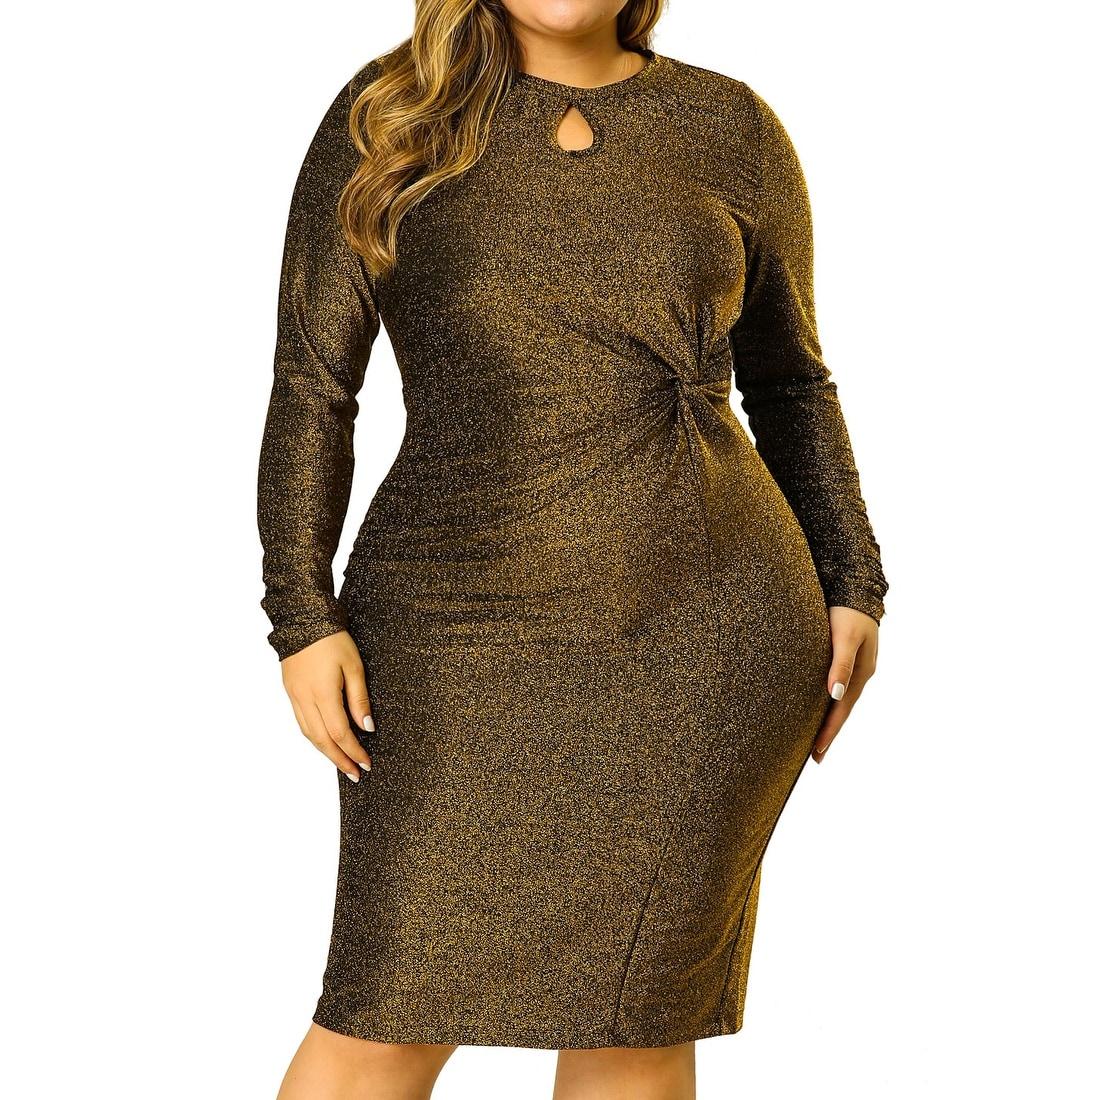 Plus Size Sparkly Party Dresses Pasteurinstituteindia Com